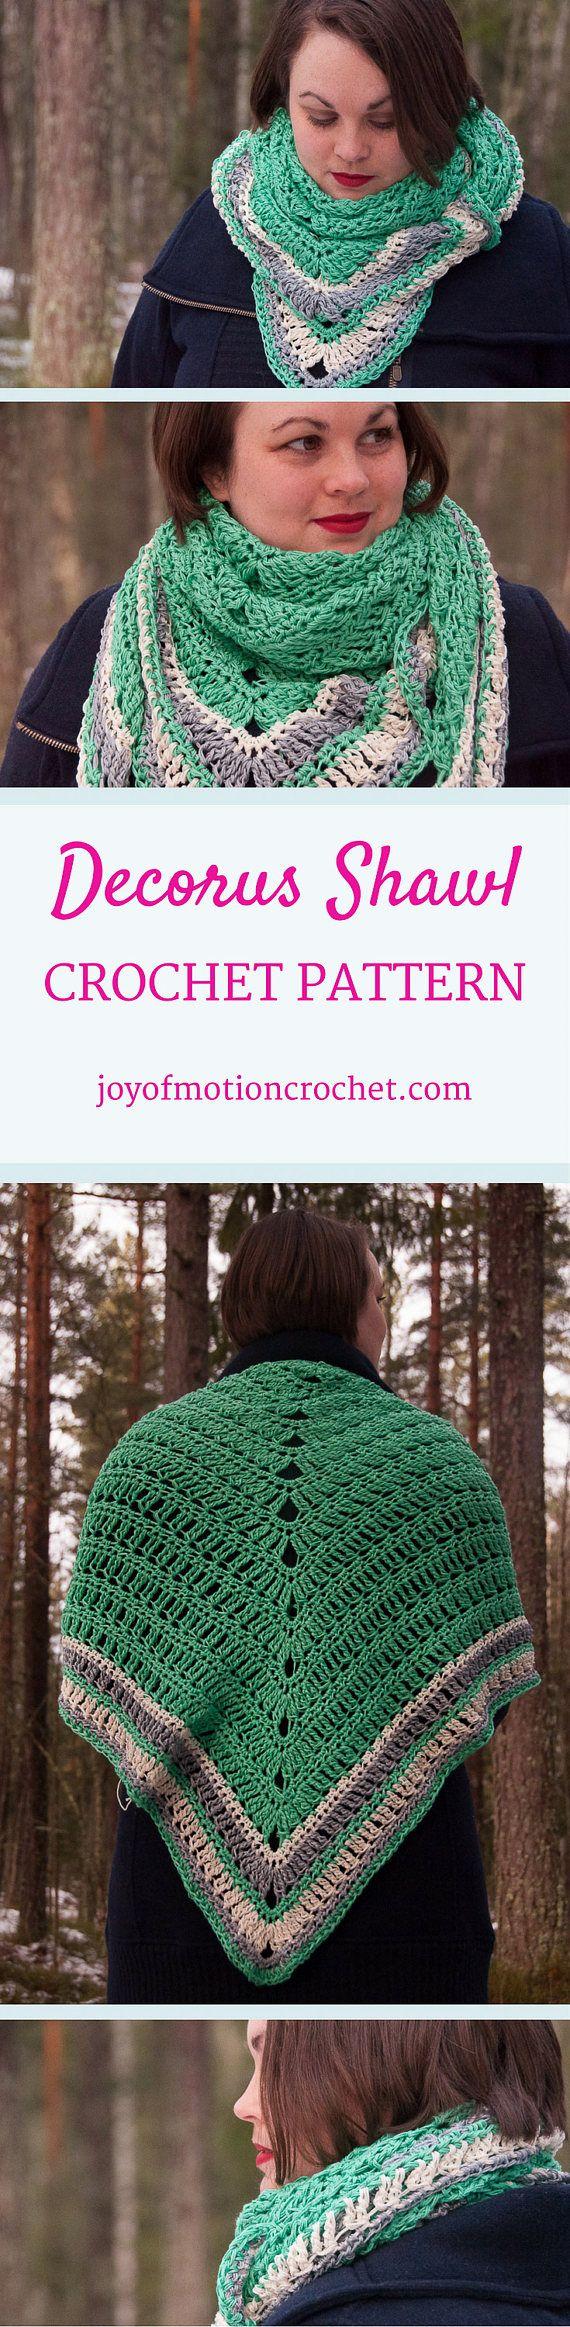 CROCHET PATTERN - Decorus Shawl Crochet Pattern - PDF Crochet Pattern from joyofmotion on Etsy Studio